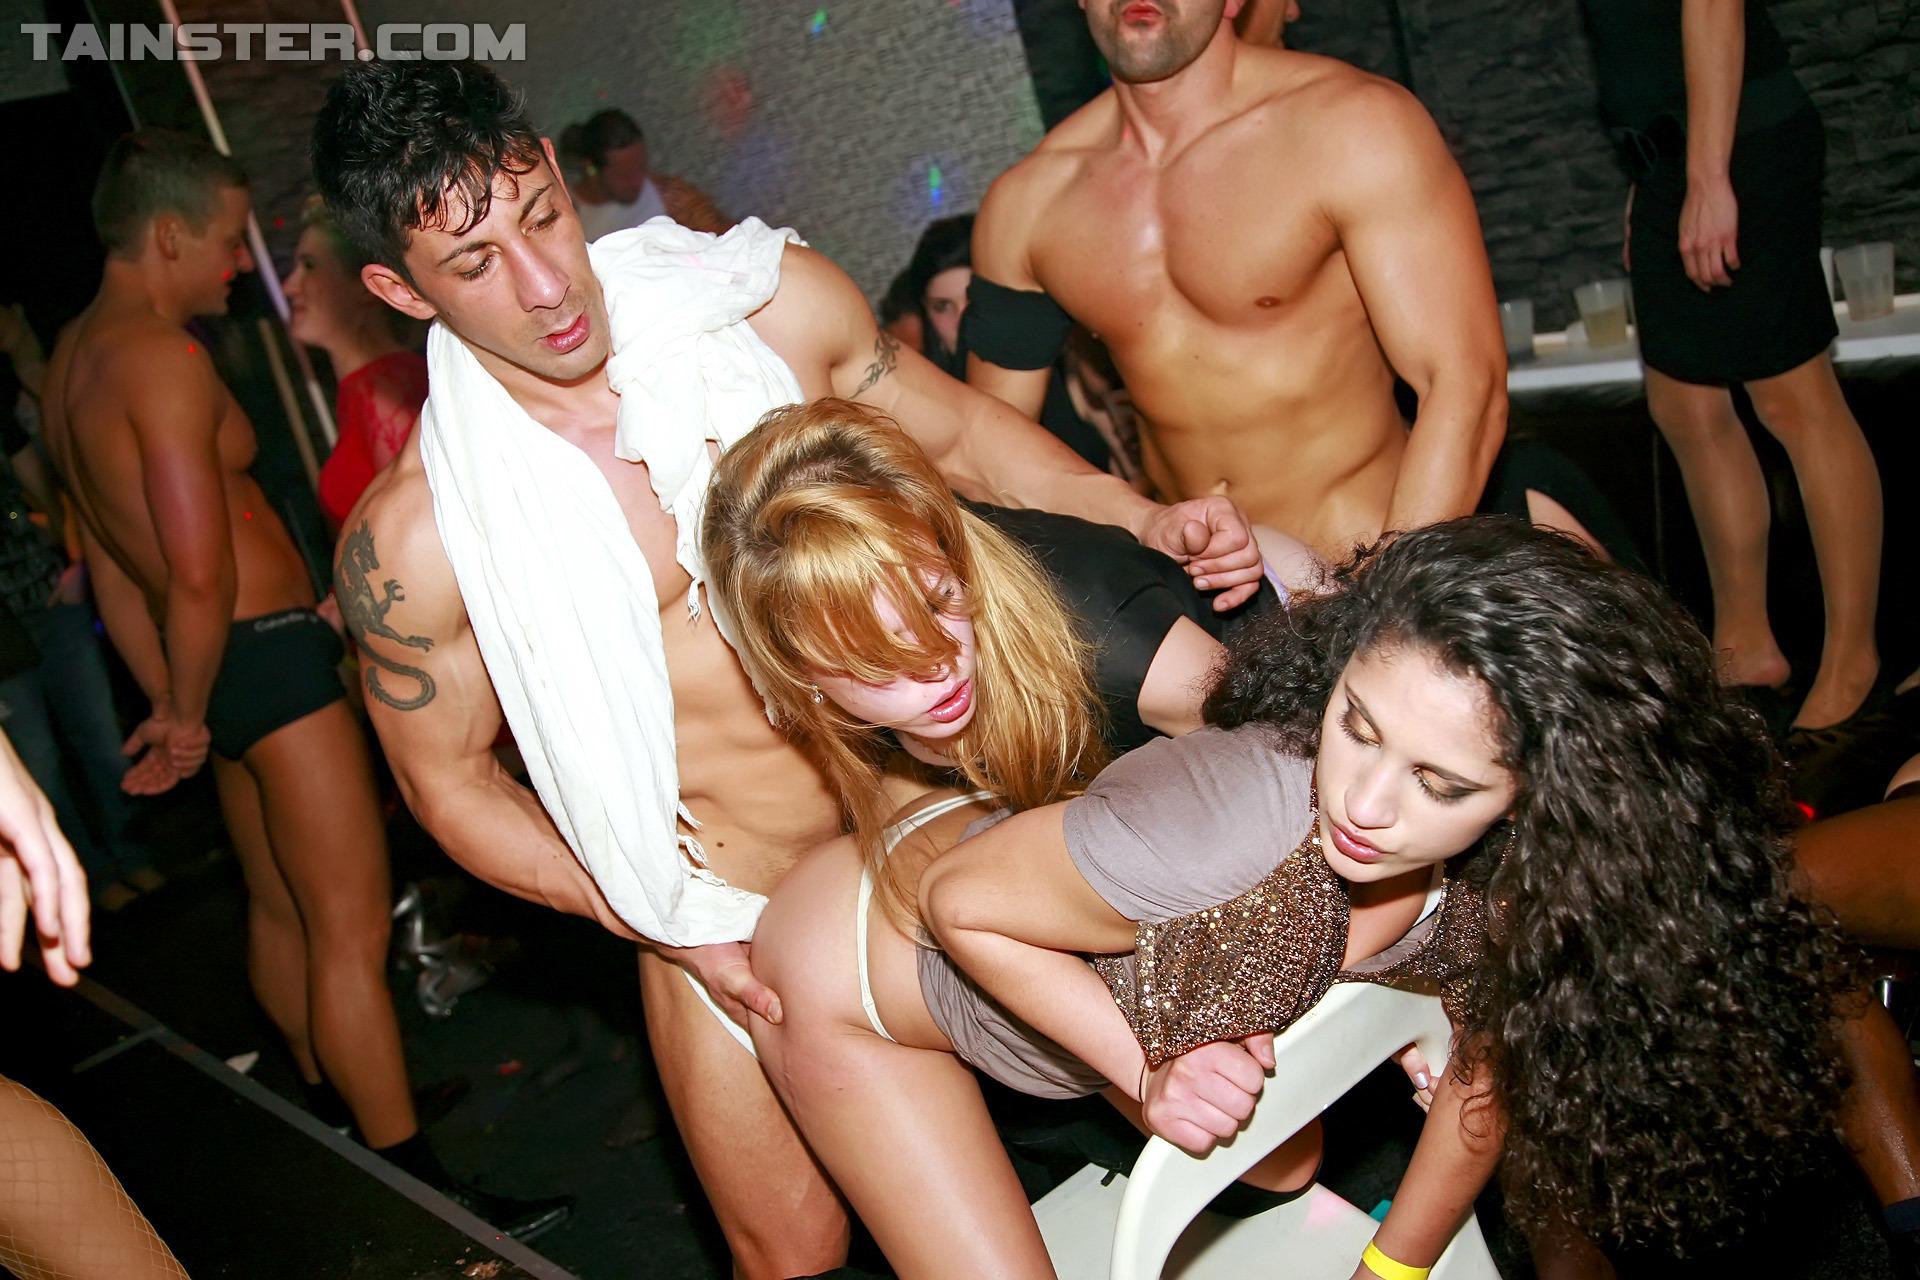 Hardcore Lesbian Scissor Sex